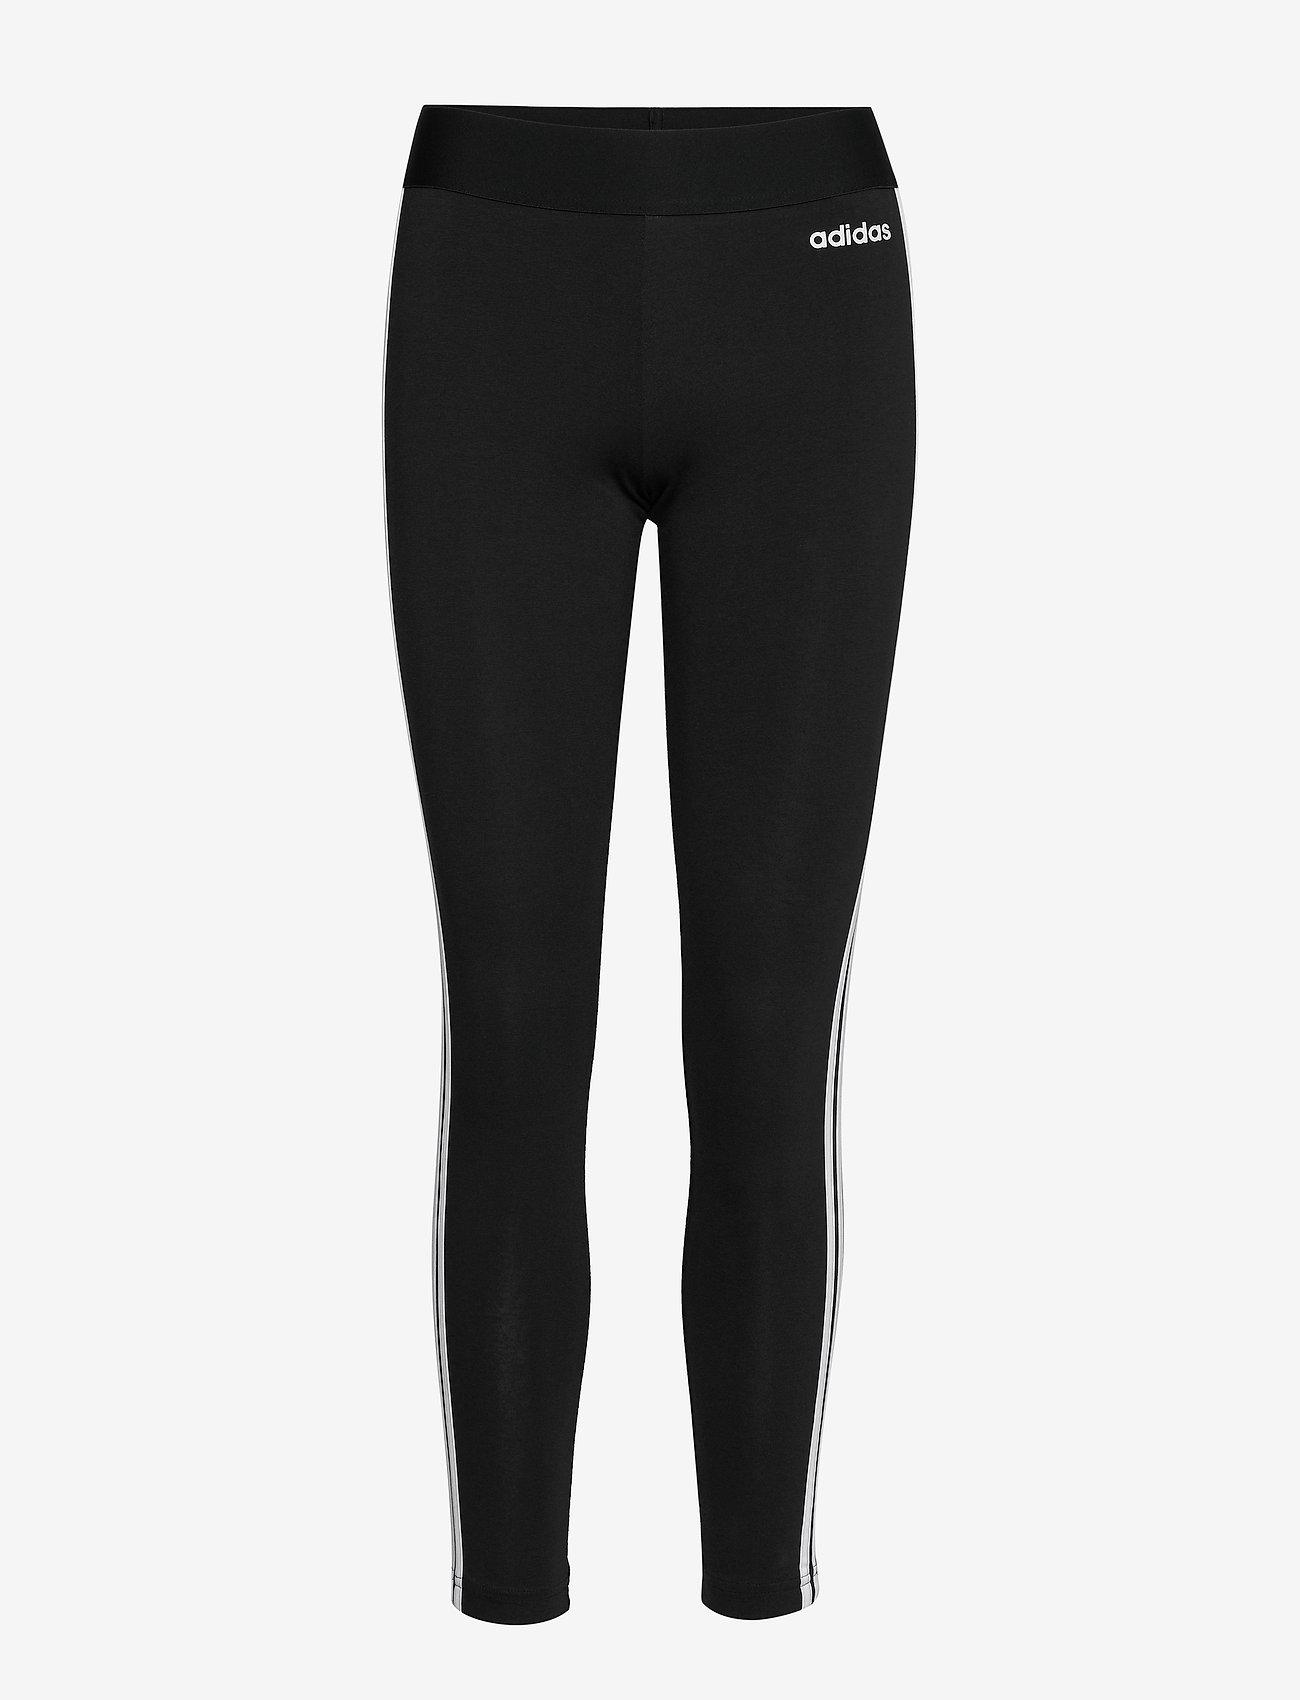 W E 3s Tight (Black/white) - adidas Performance XsnF8s